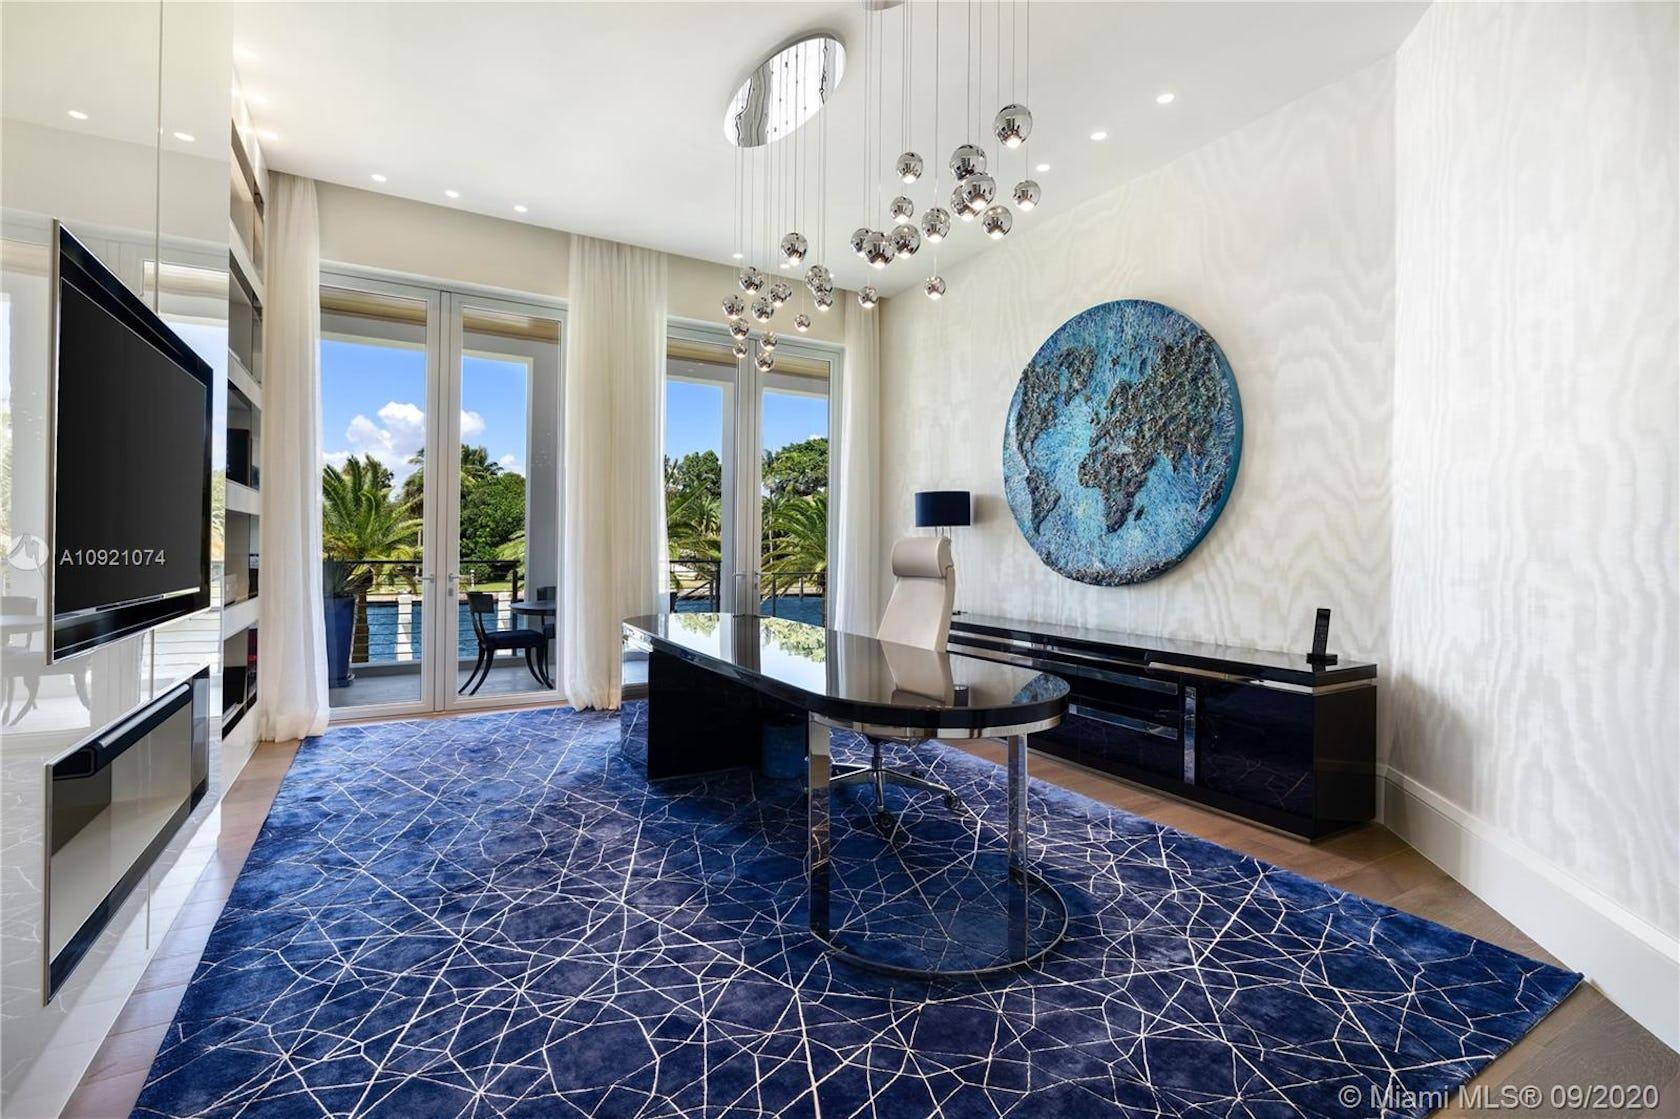 flooring furniture floor room indoors lobby living room rug interior design reception